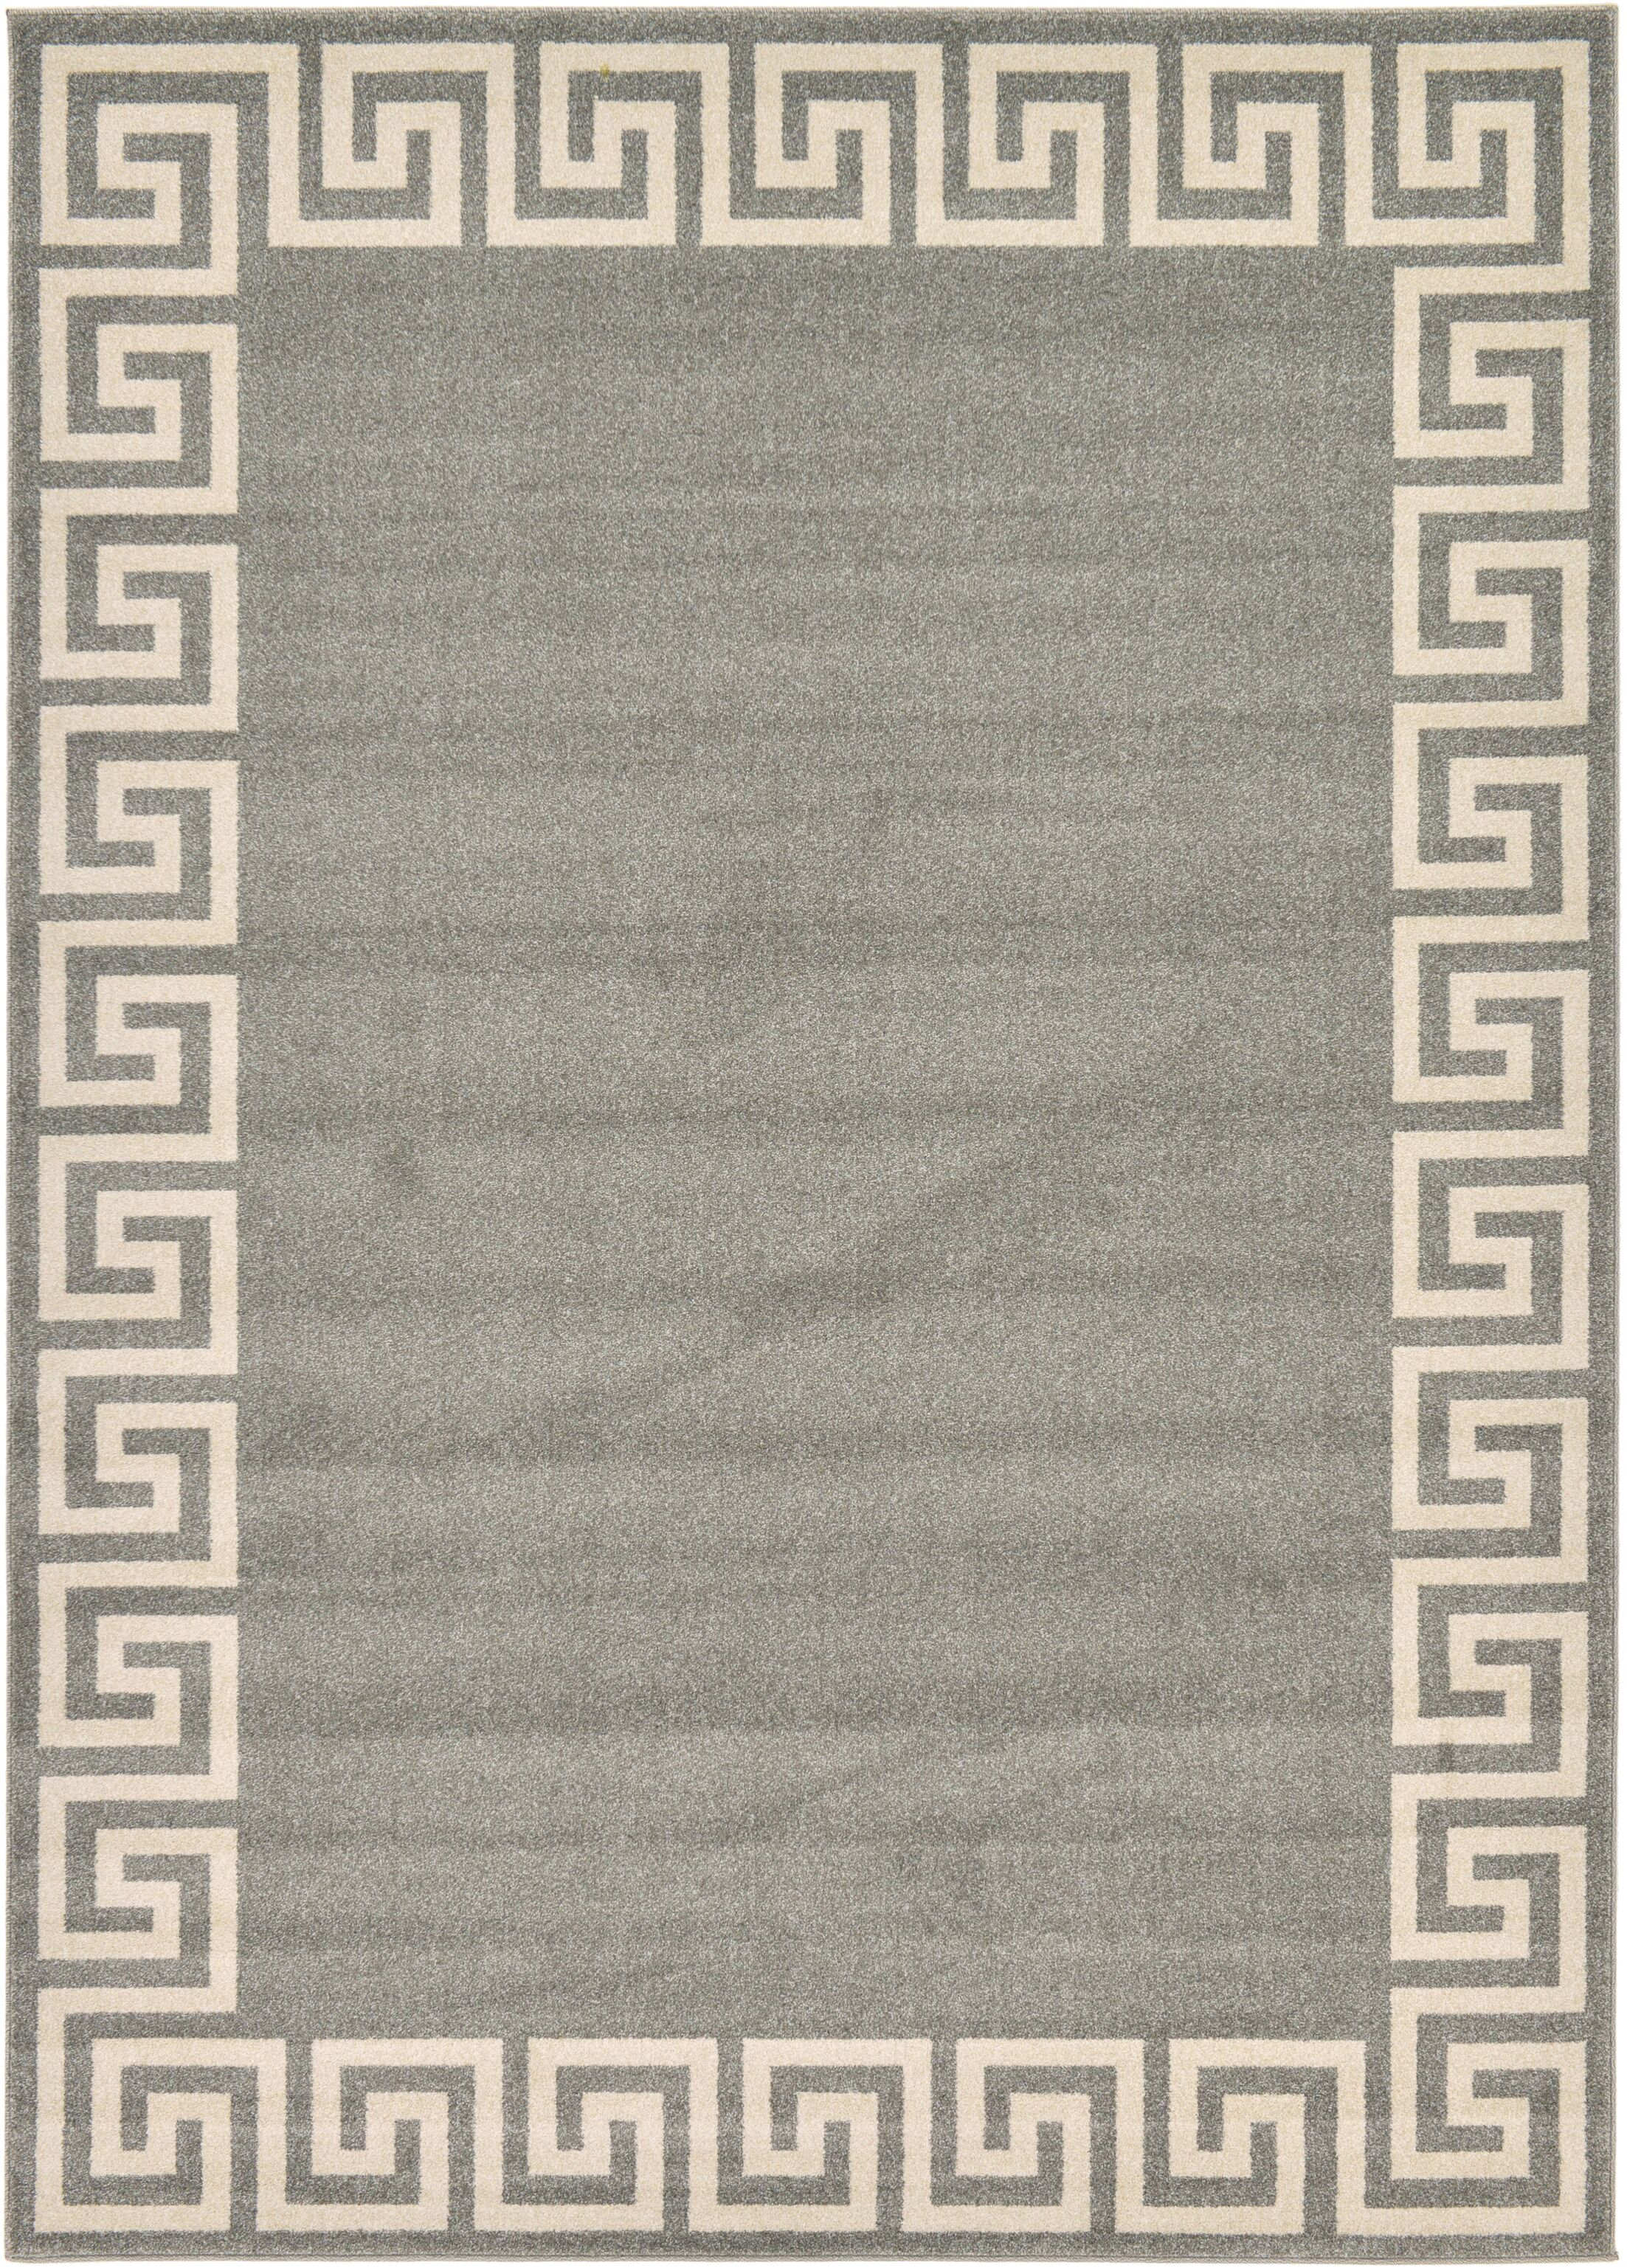 Cendrillon Gray Area Rug Rug Size: Rectangle 7' x 10'